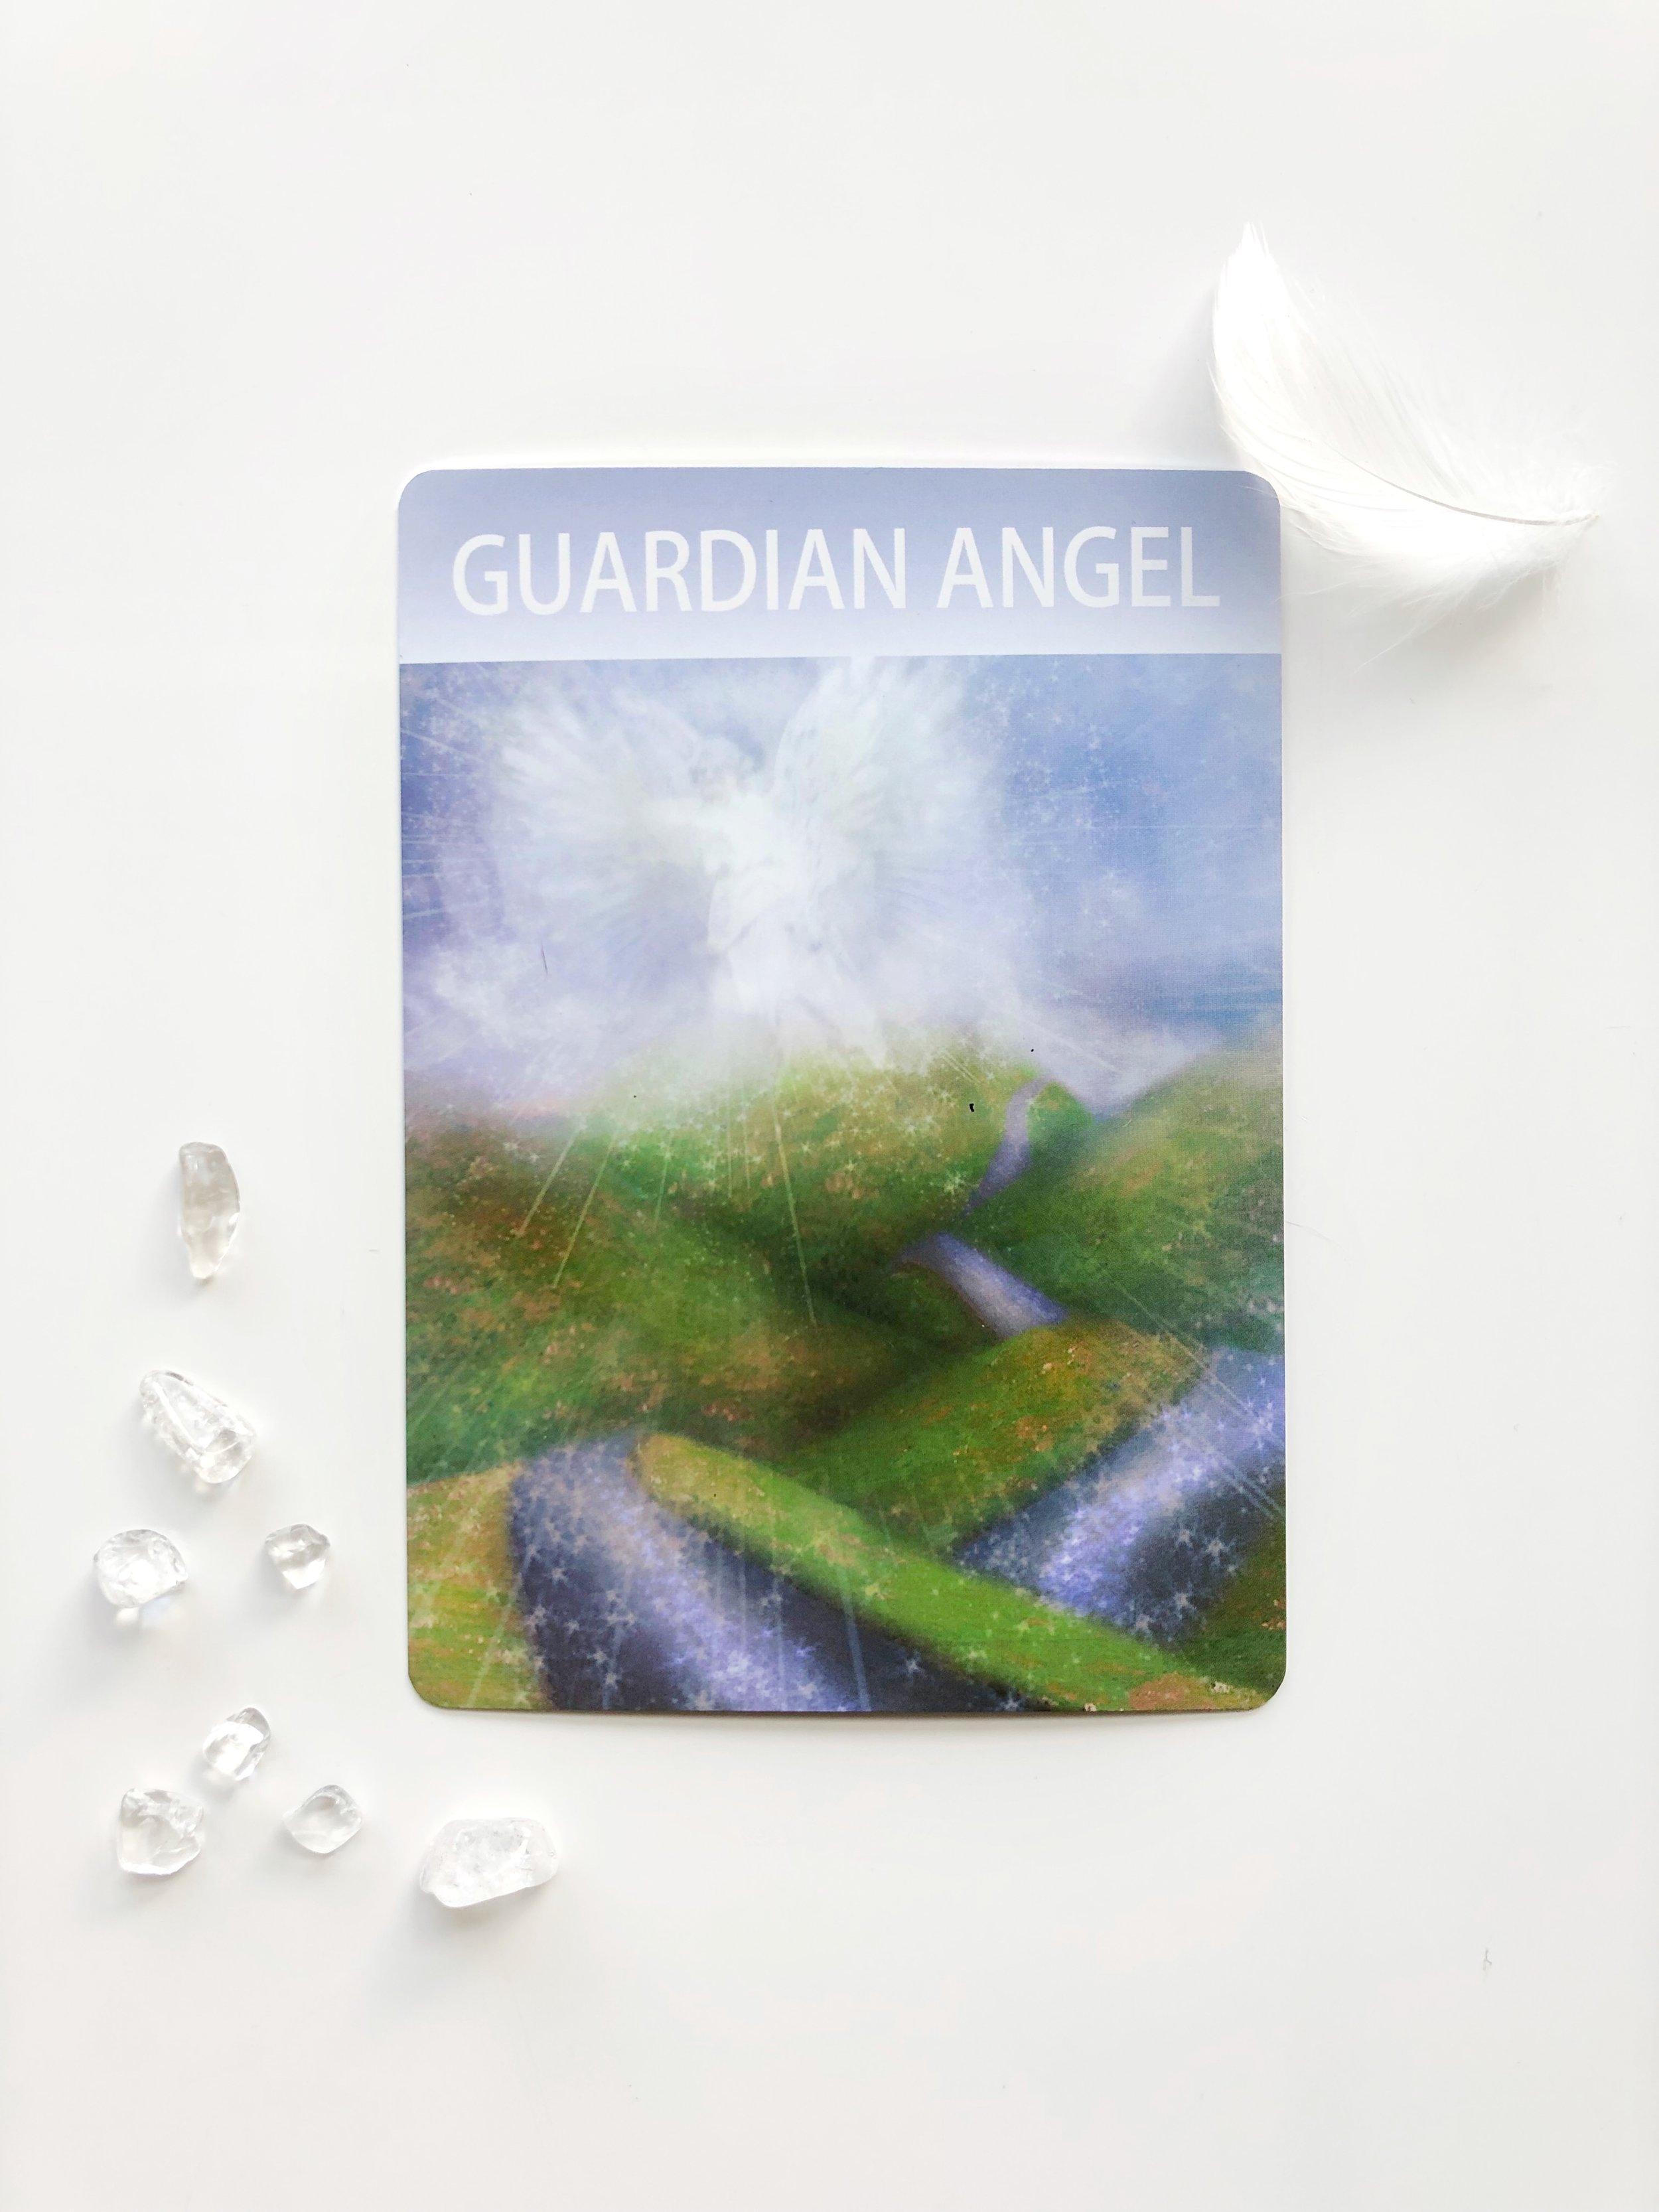 Guardian Angel.jpeg